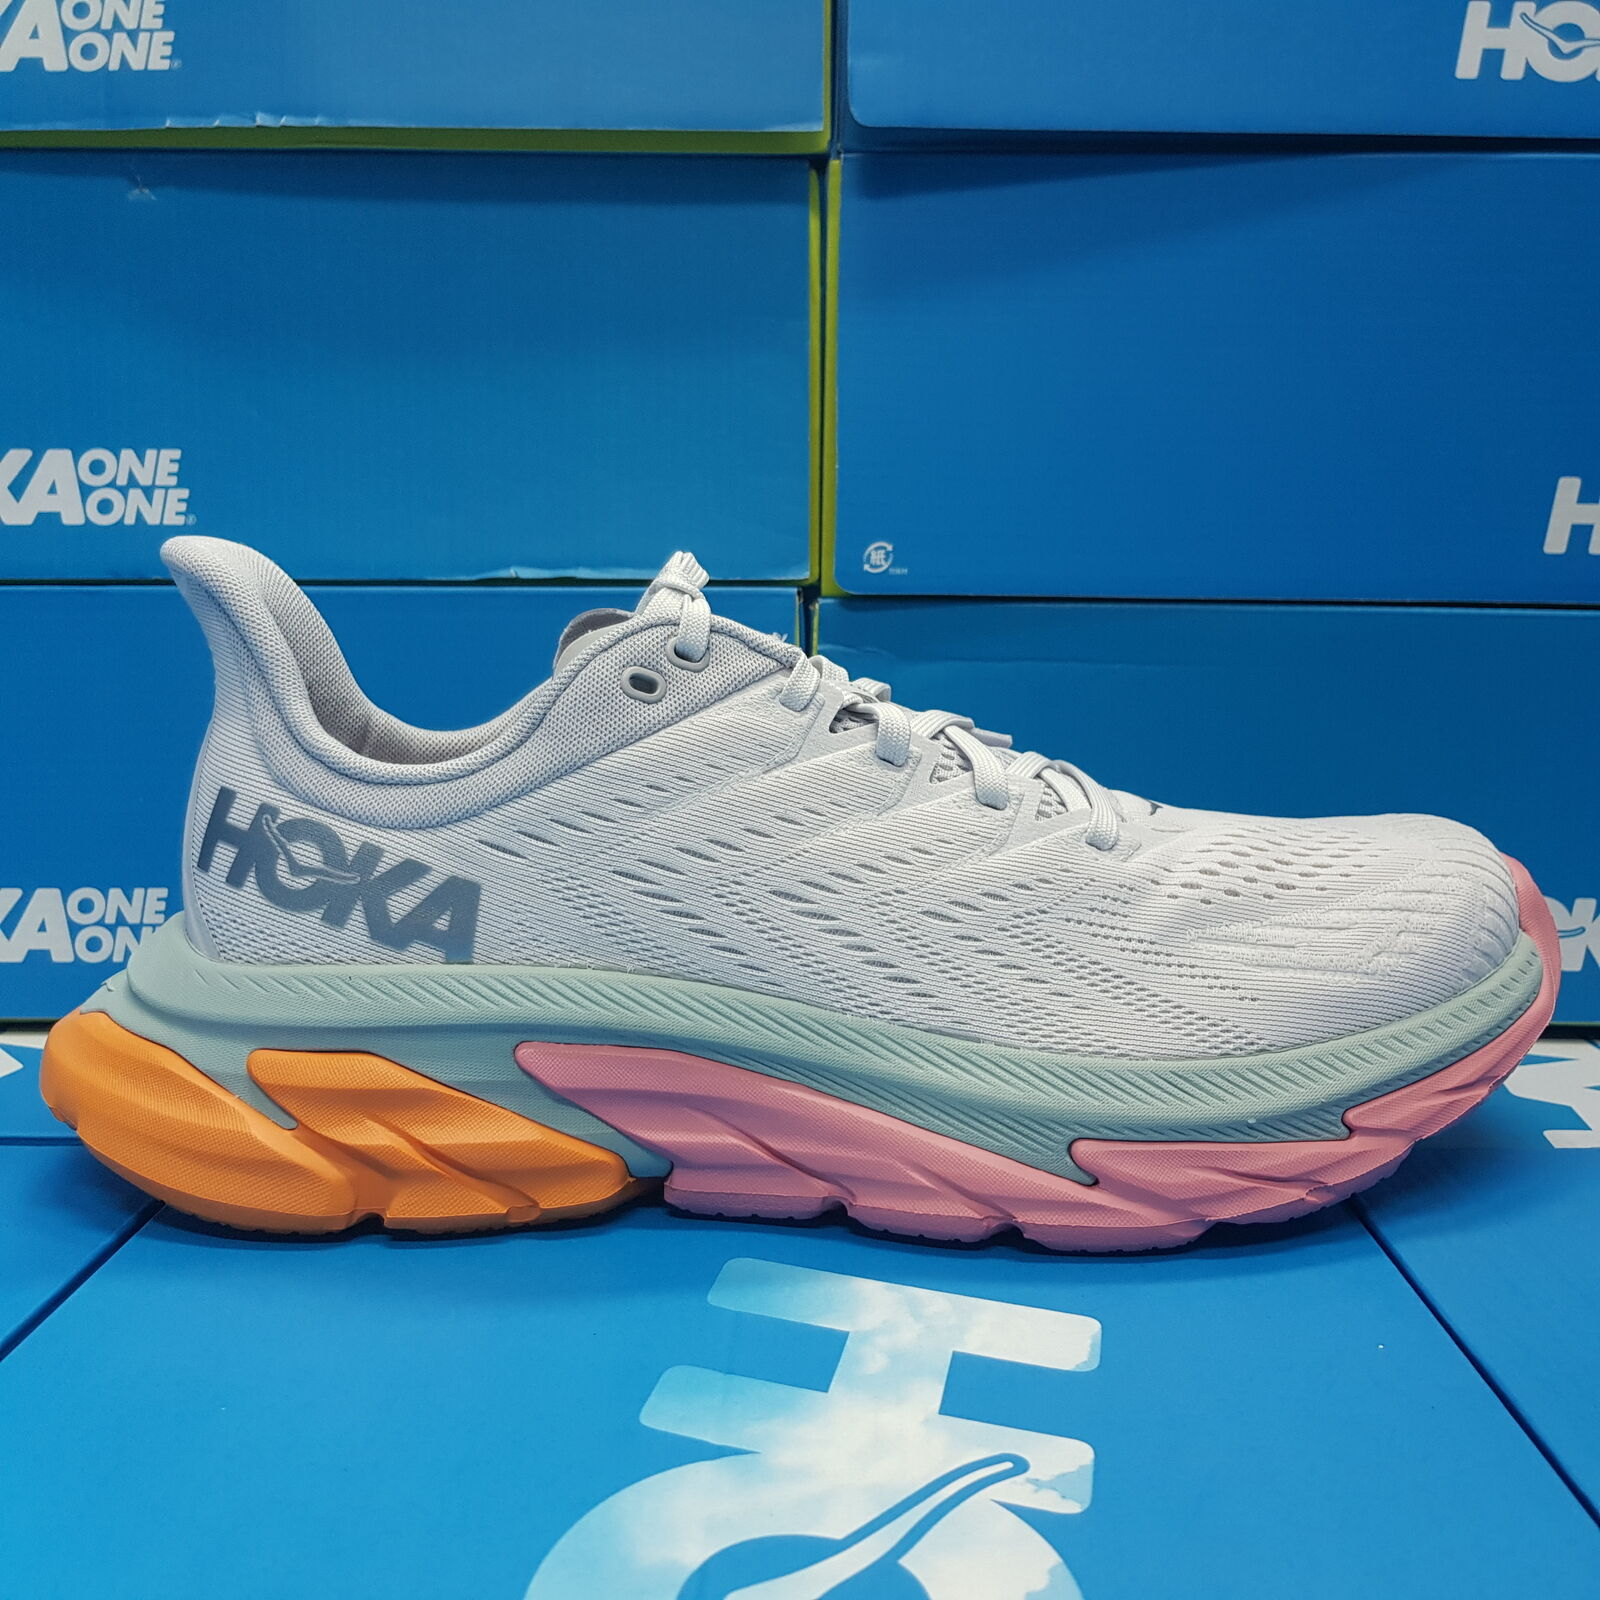 NEW Hoka One One Clifton EDGE 1110510/NCLR Orange/White/Light Blue Running Shoes